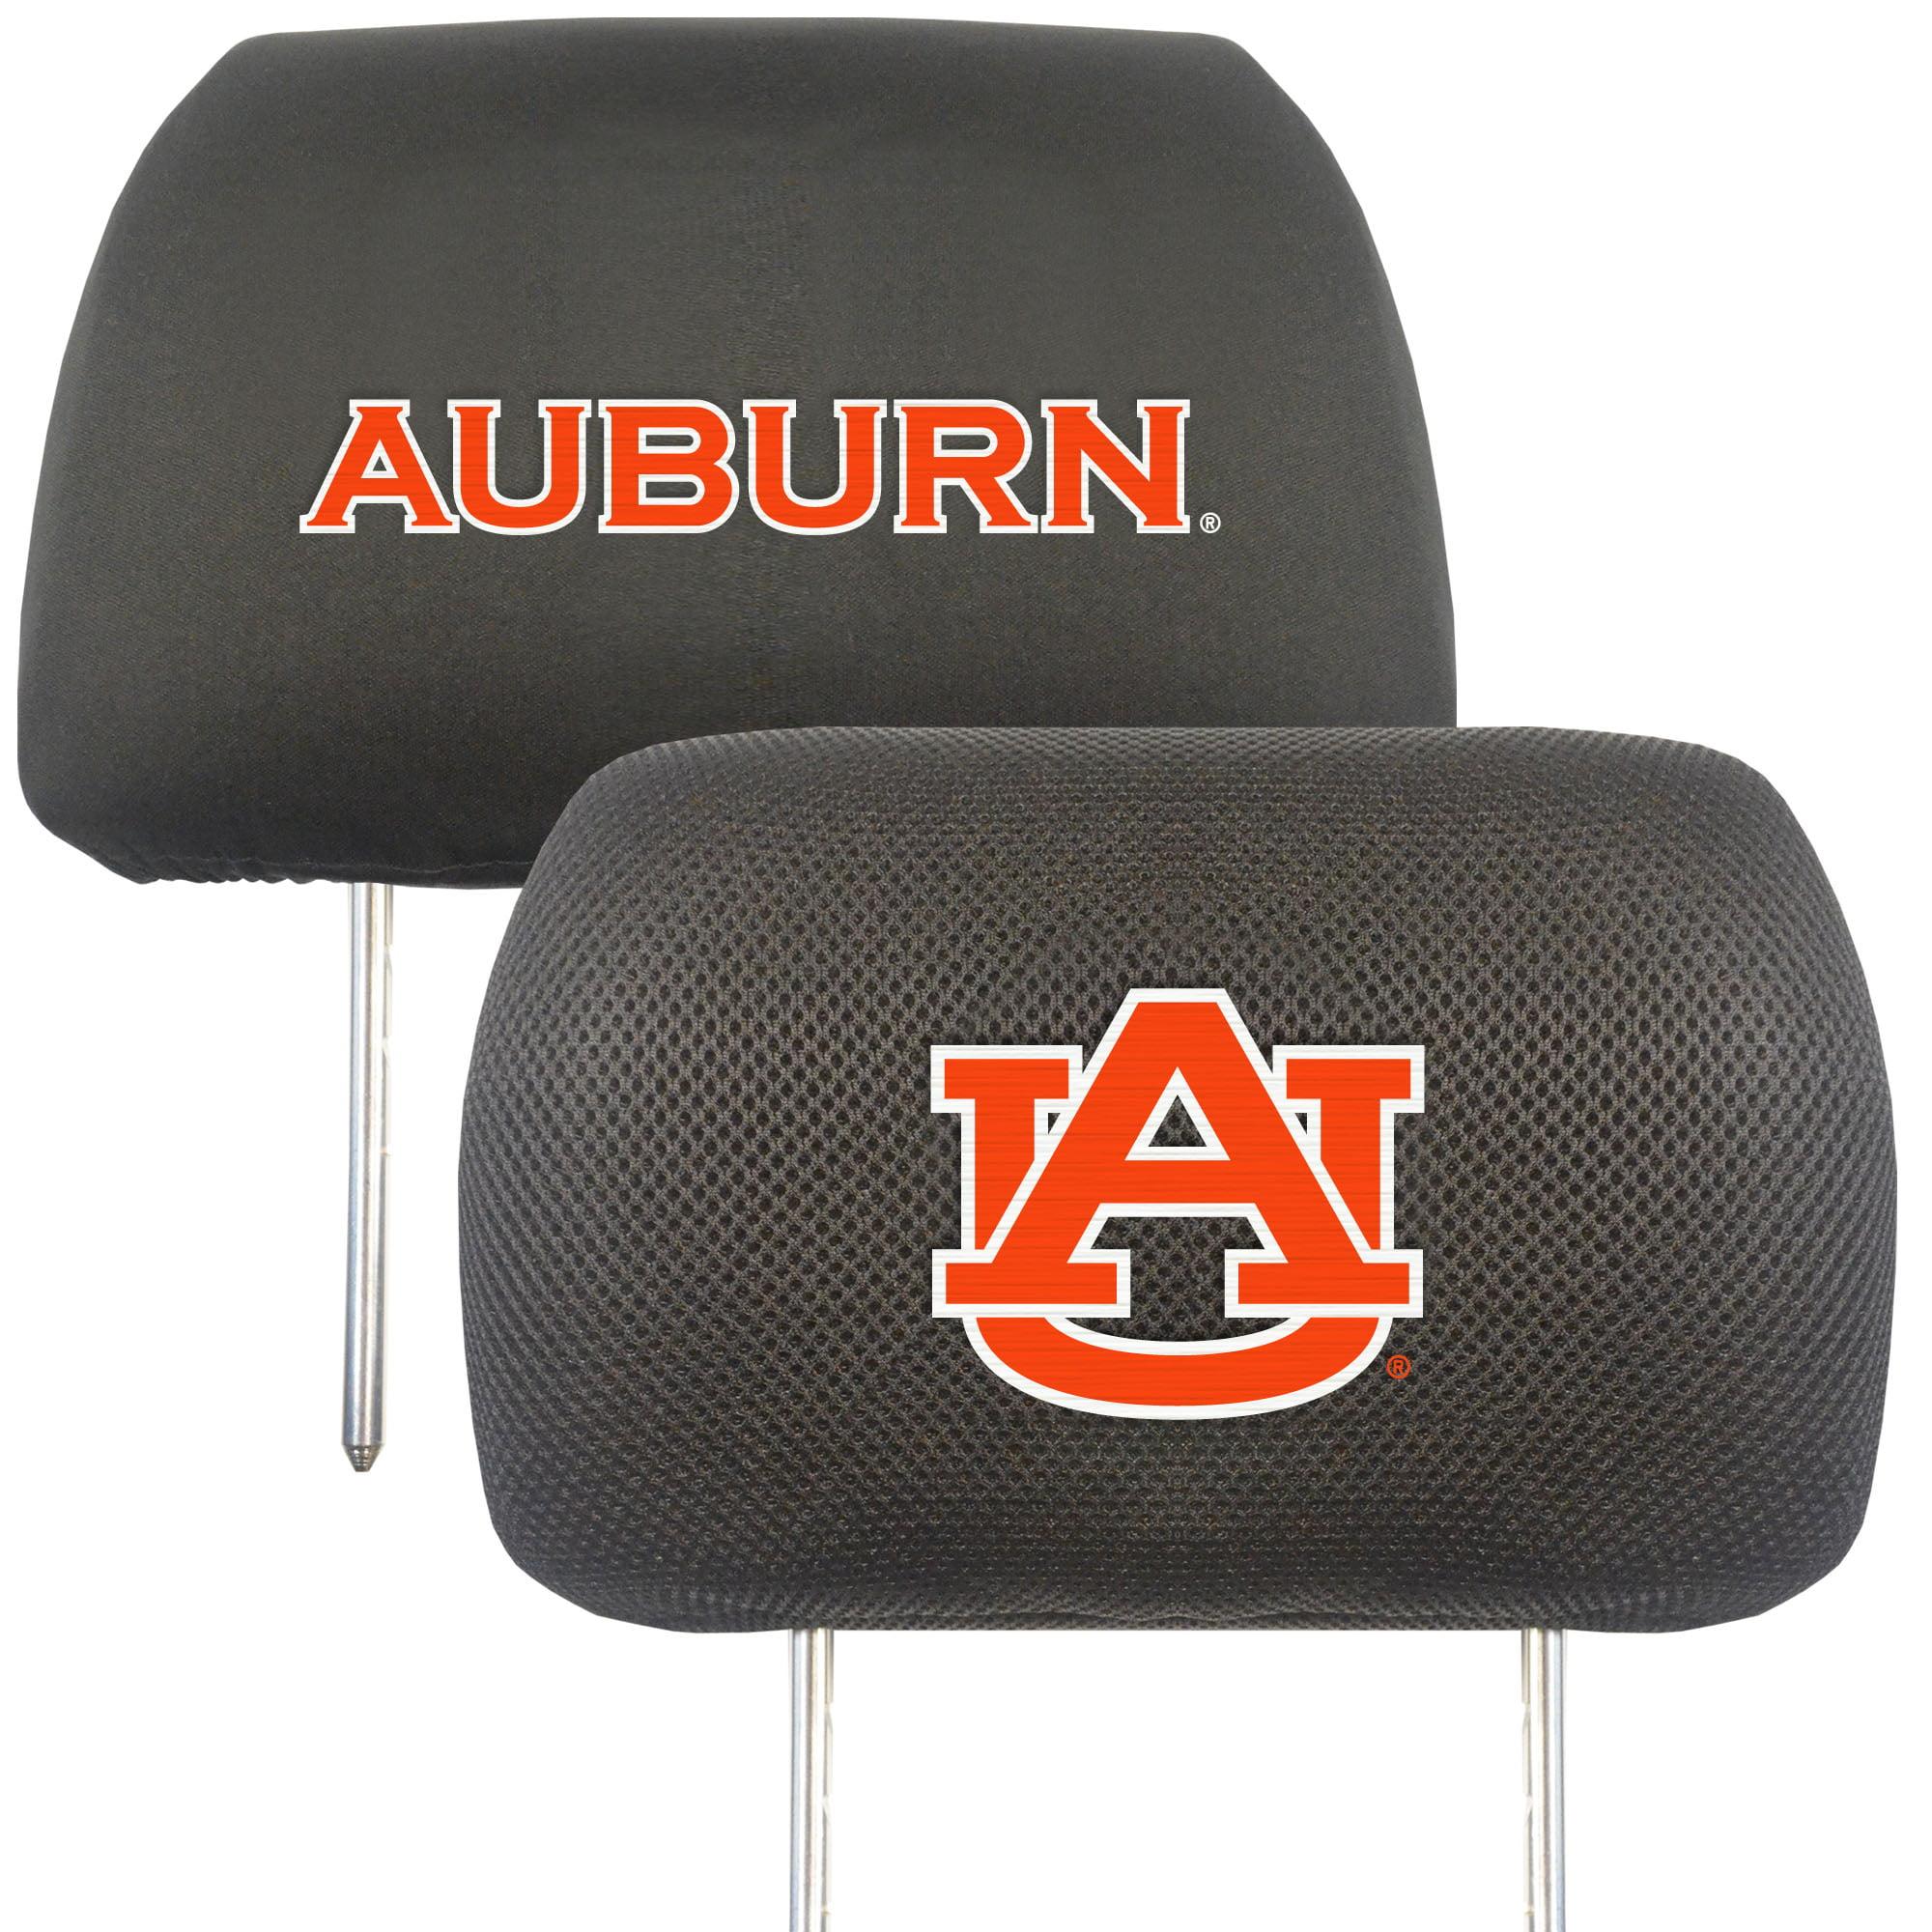 NCAA Auburn University Tigers Head Rest Cover Automotive Accessory